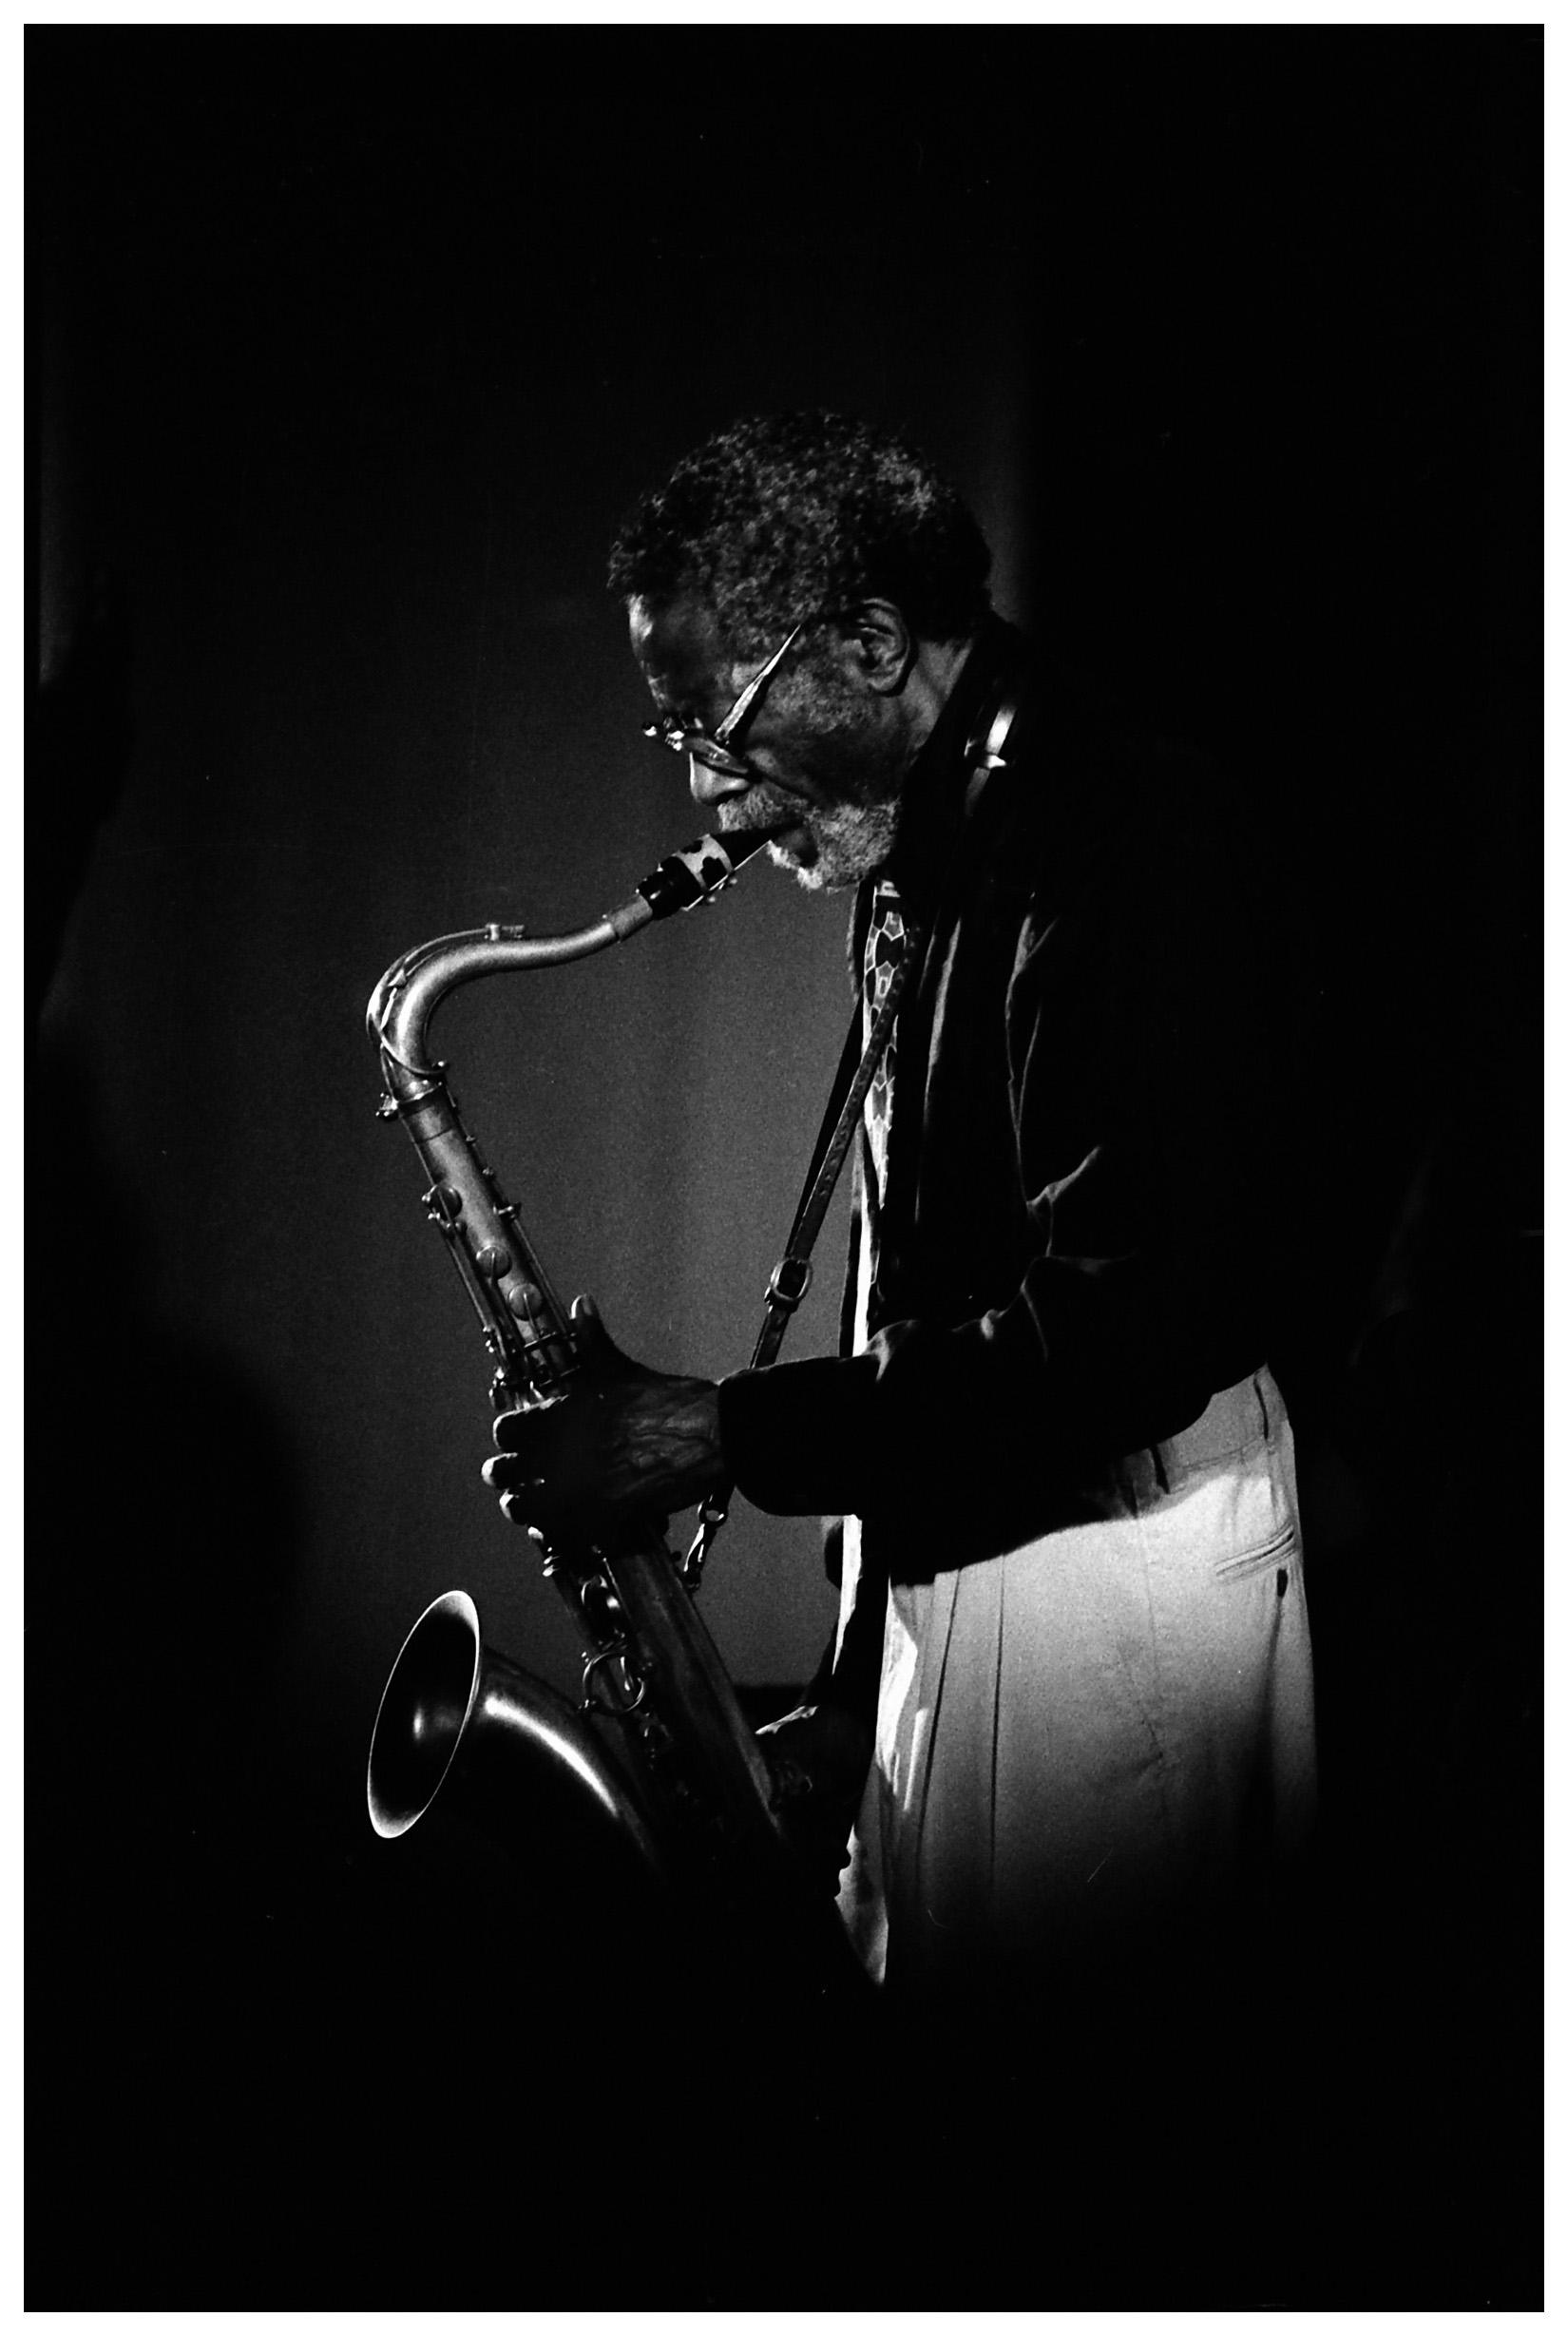 CZTのホームページ-私的なジャズの名盤─ジョー・ヘンダーソン